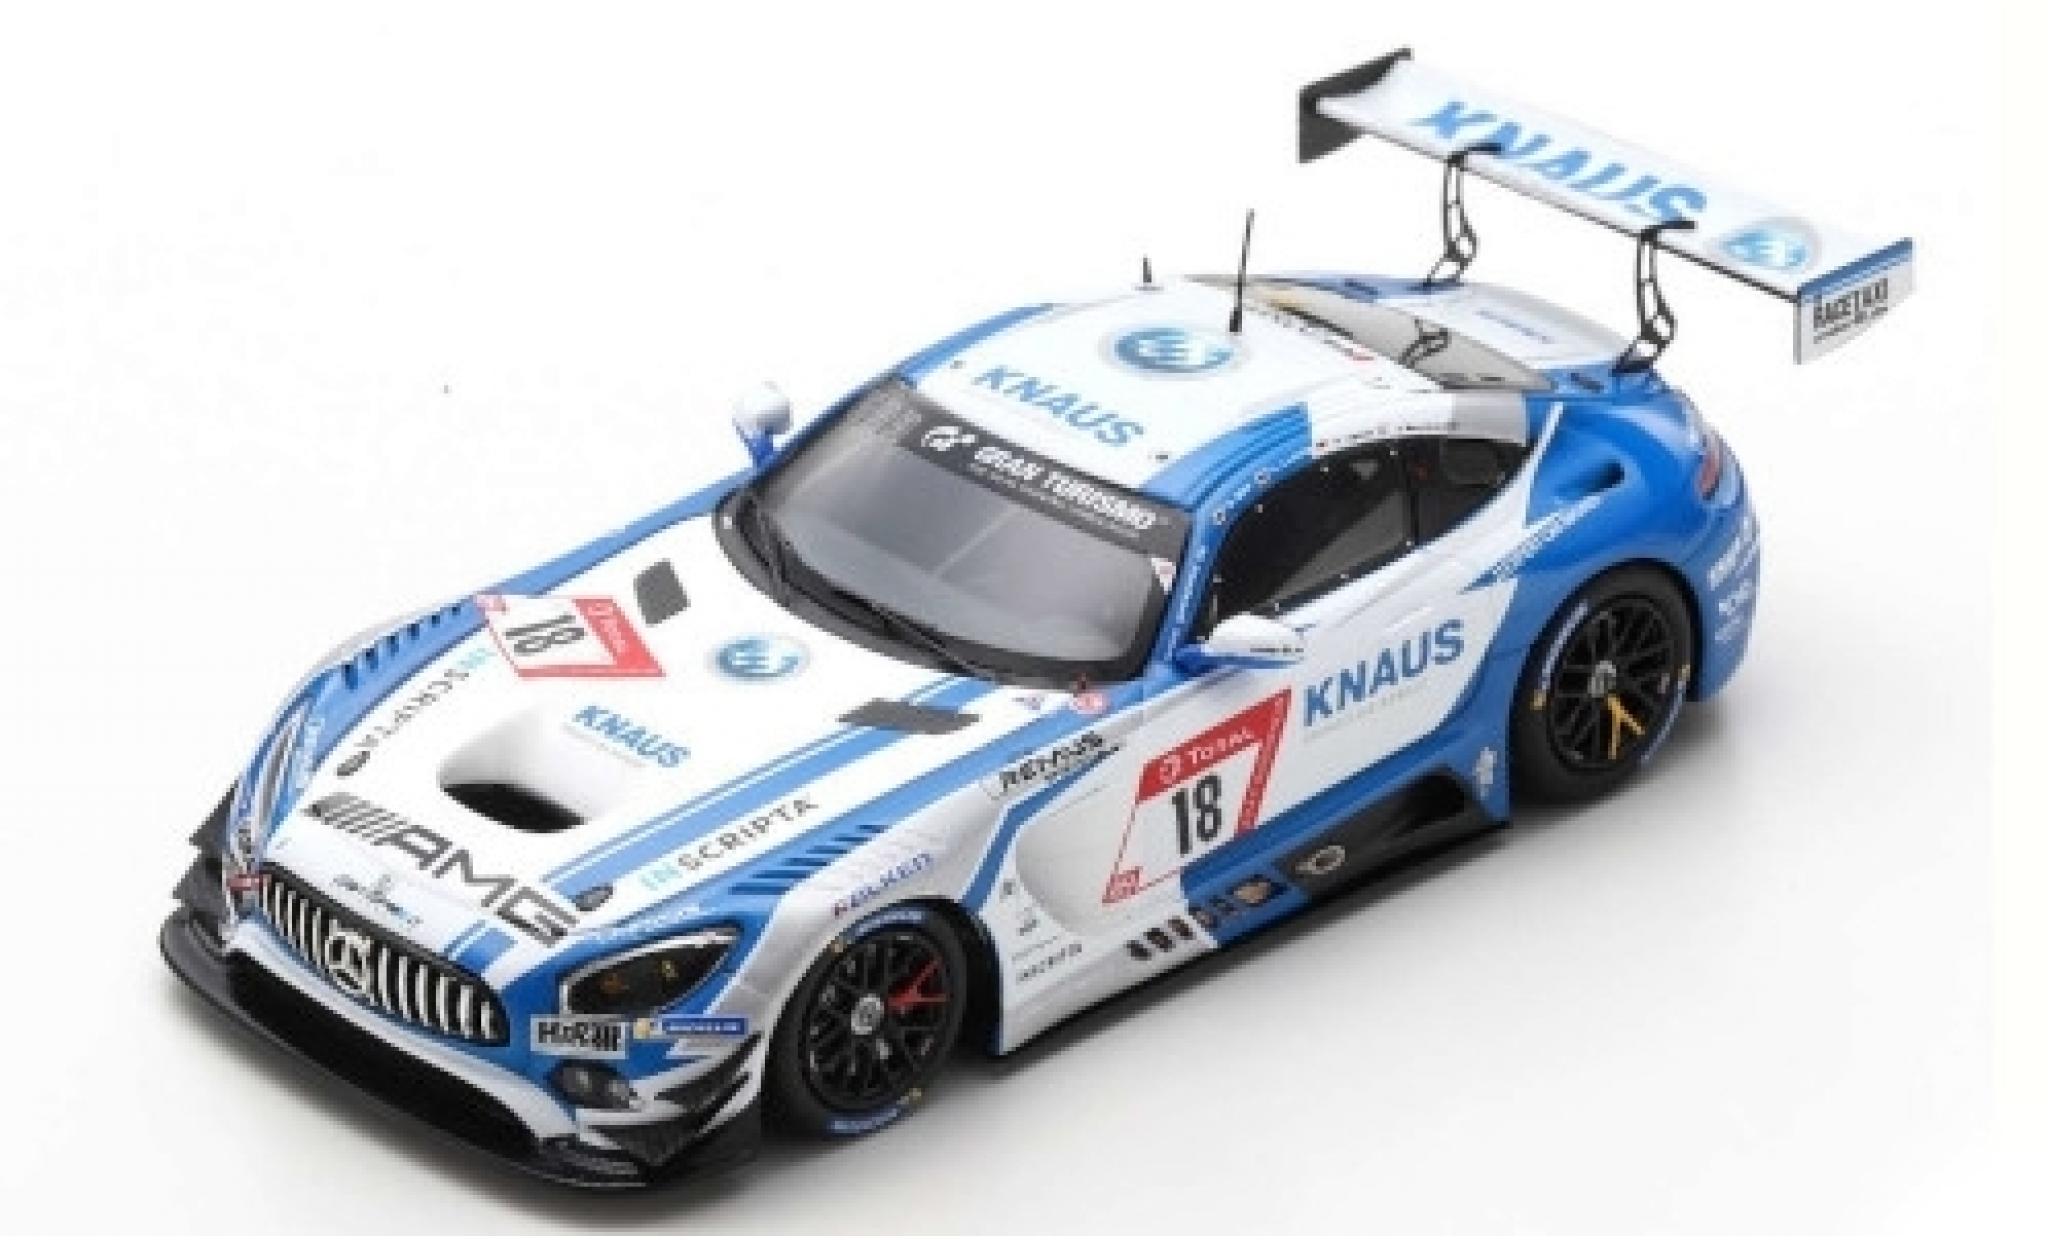 Mercedes AMG GT 1/43 Spark 3 No.18 GetSpeed Performance Knaus 24h Nürburgring 2019 F.Vettel/P.Ellis/L.Ludwig/J.Szymkowiak